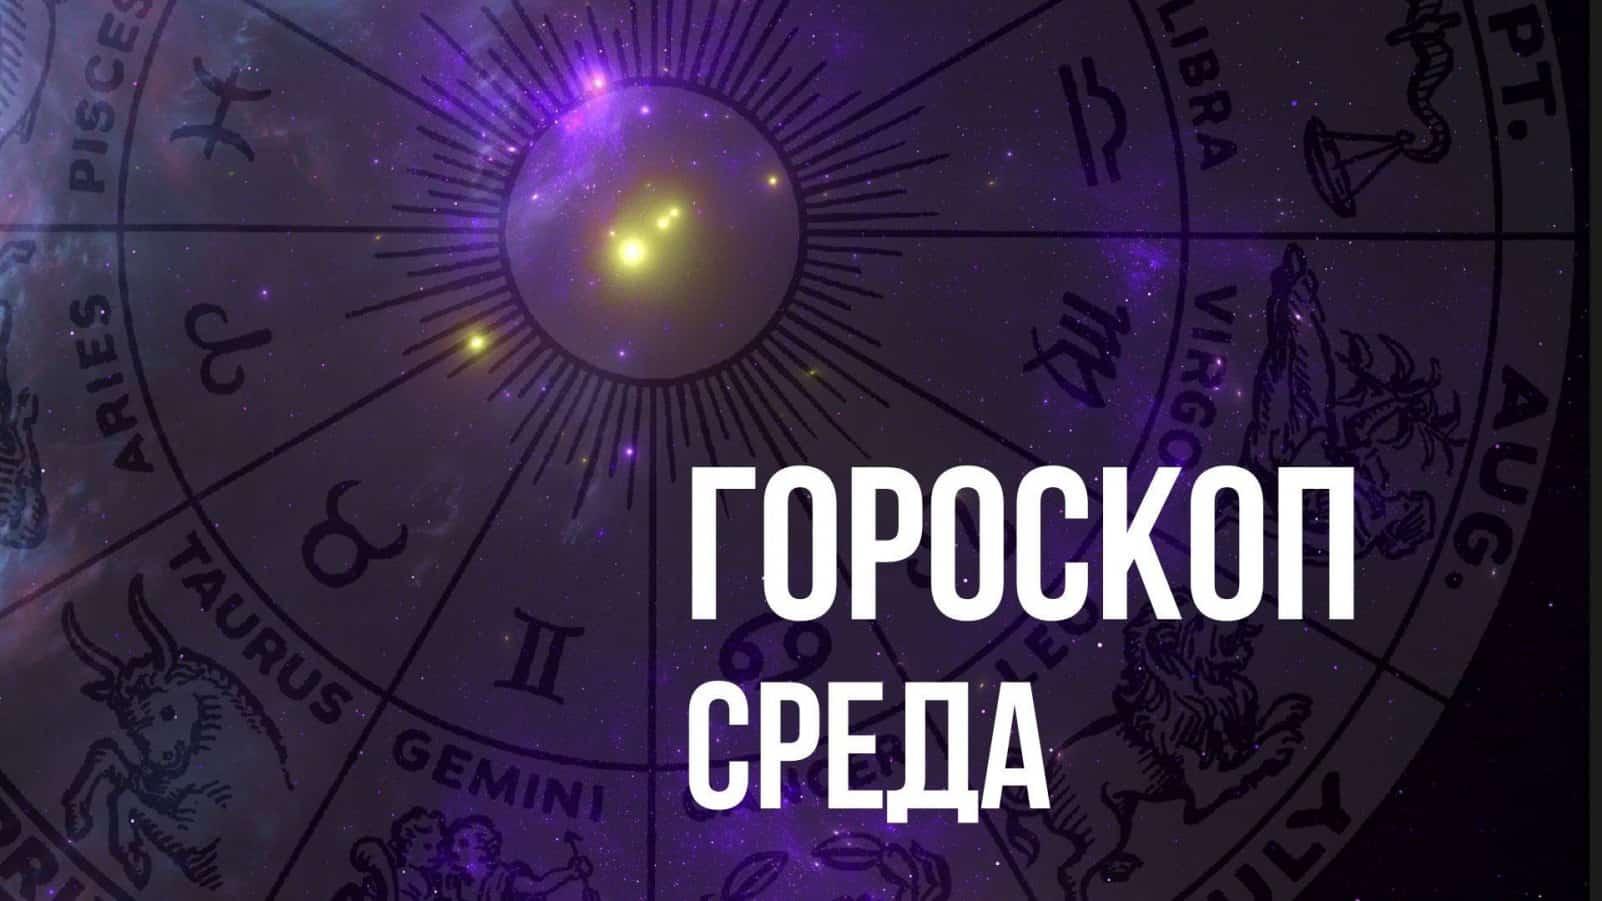 Гороскоп на среду 10 марта для каждого знака Зодиака